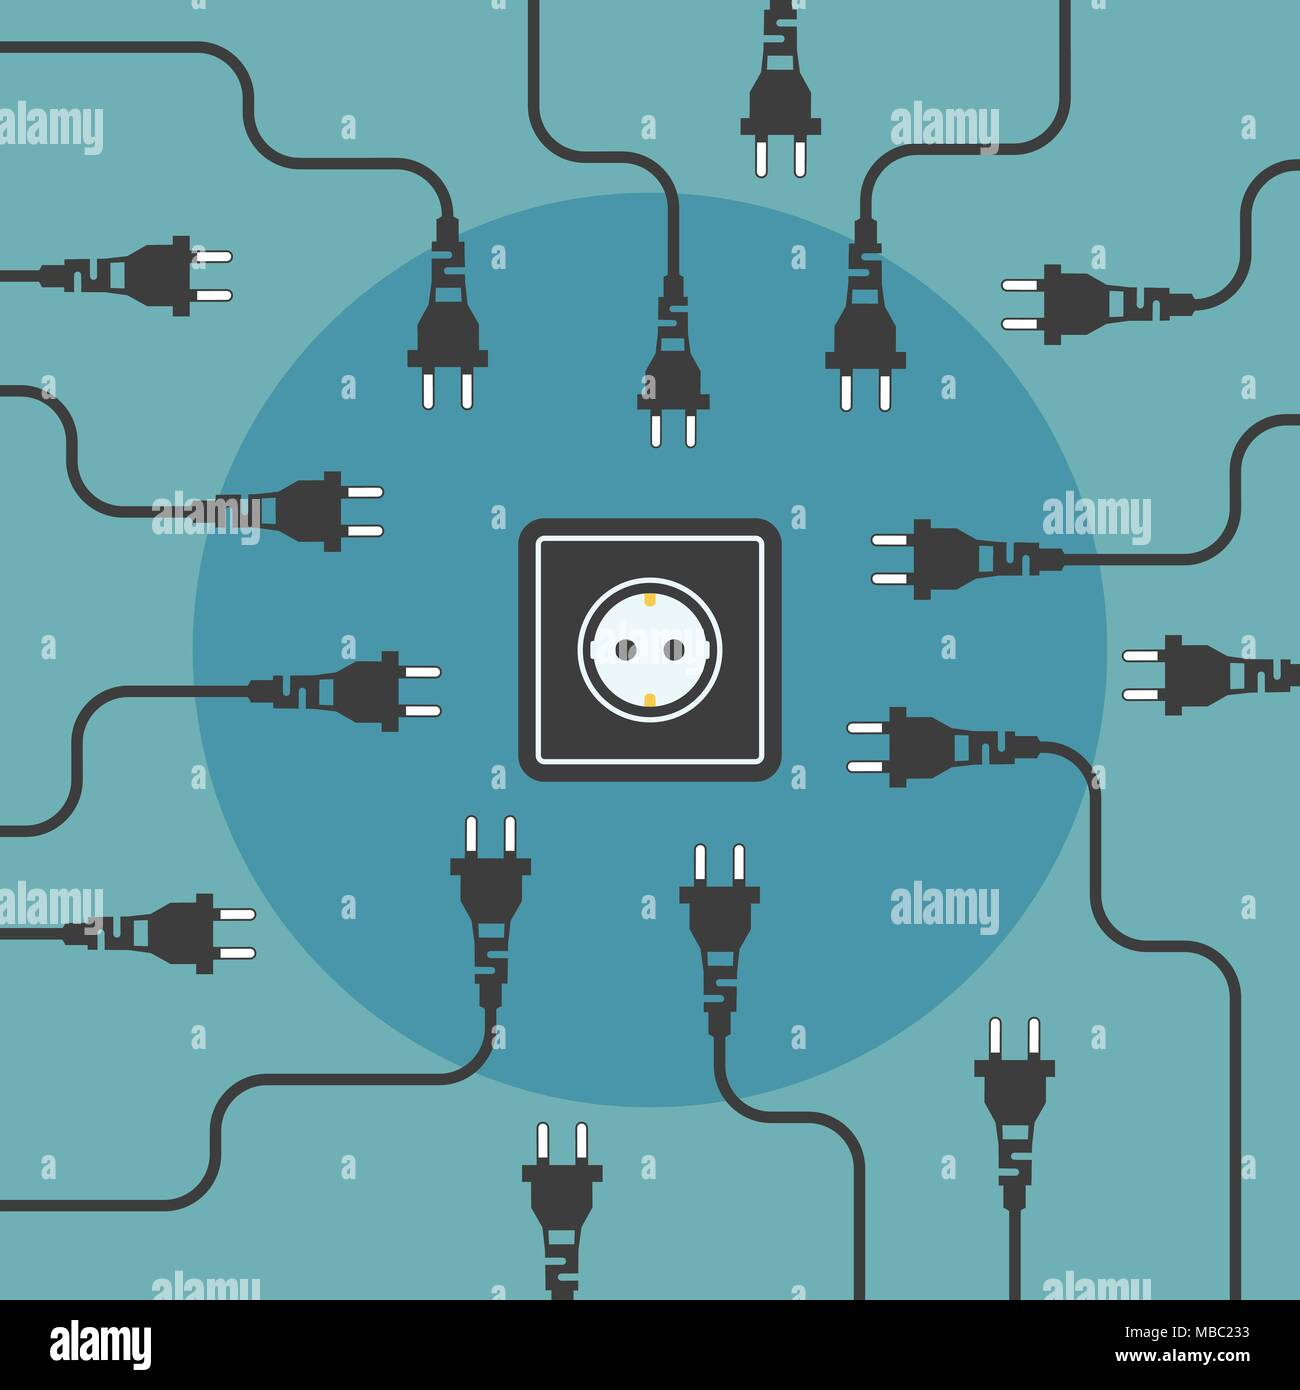 Stecker suchen. Freie Elektrizität flache Design Konzept. Vector Illustration. Stockbild